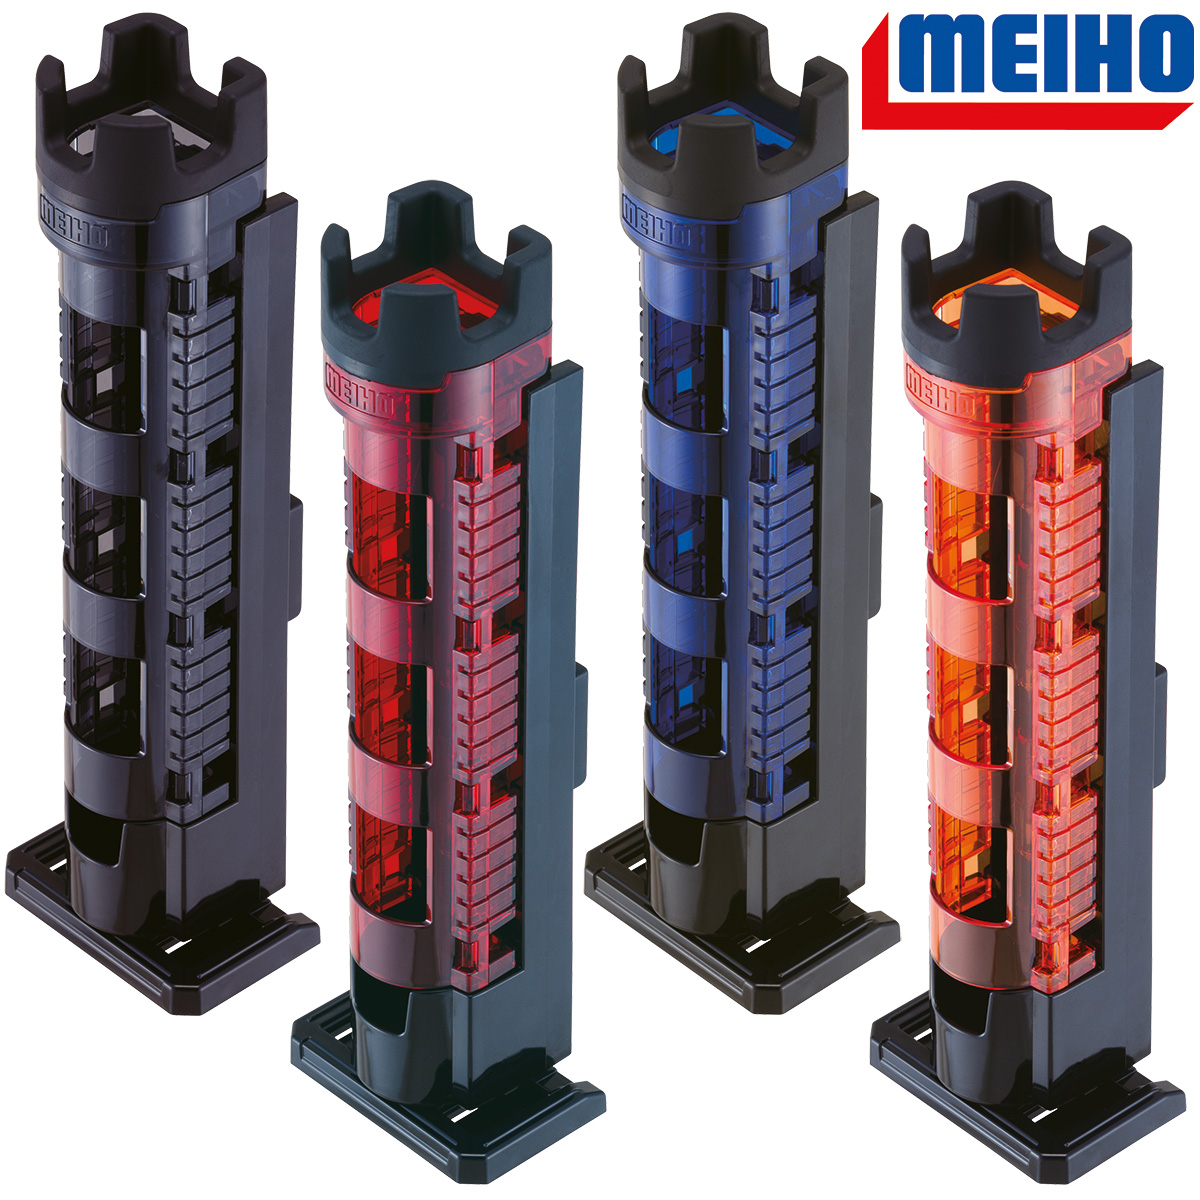 MEIHO BM-300 Light Rutenhalter Farbauswahl